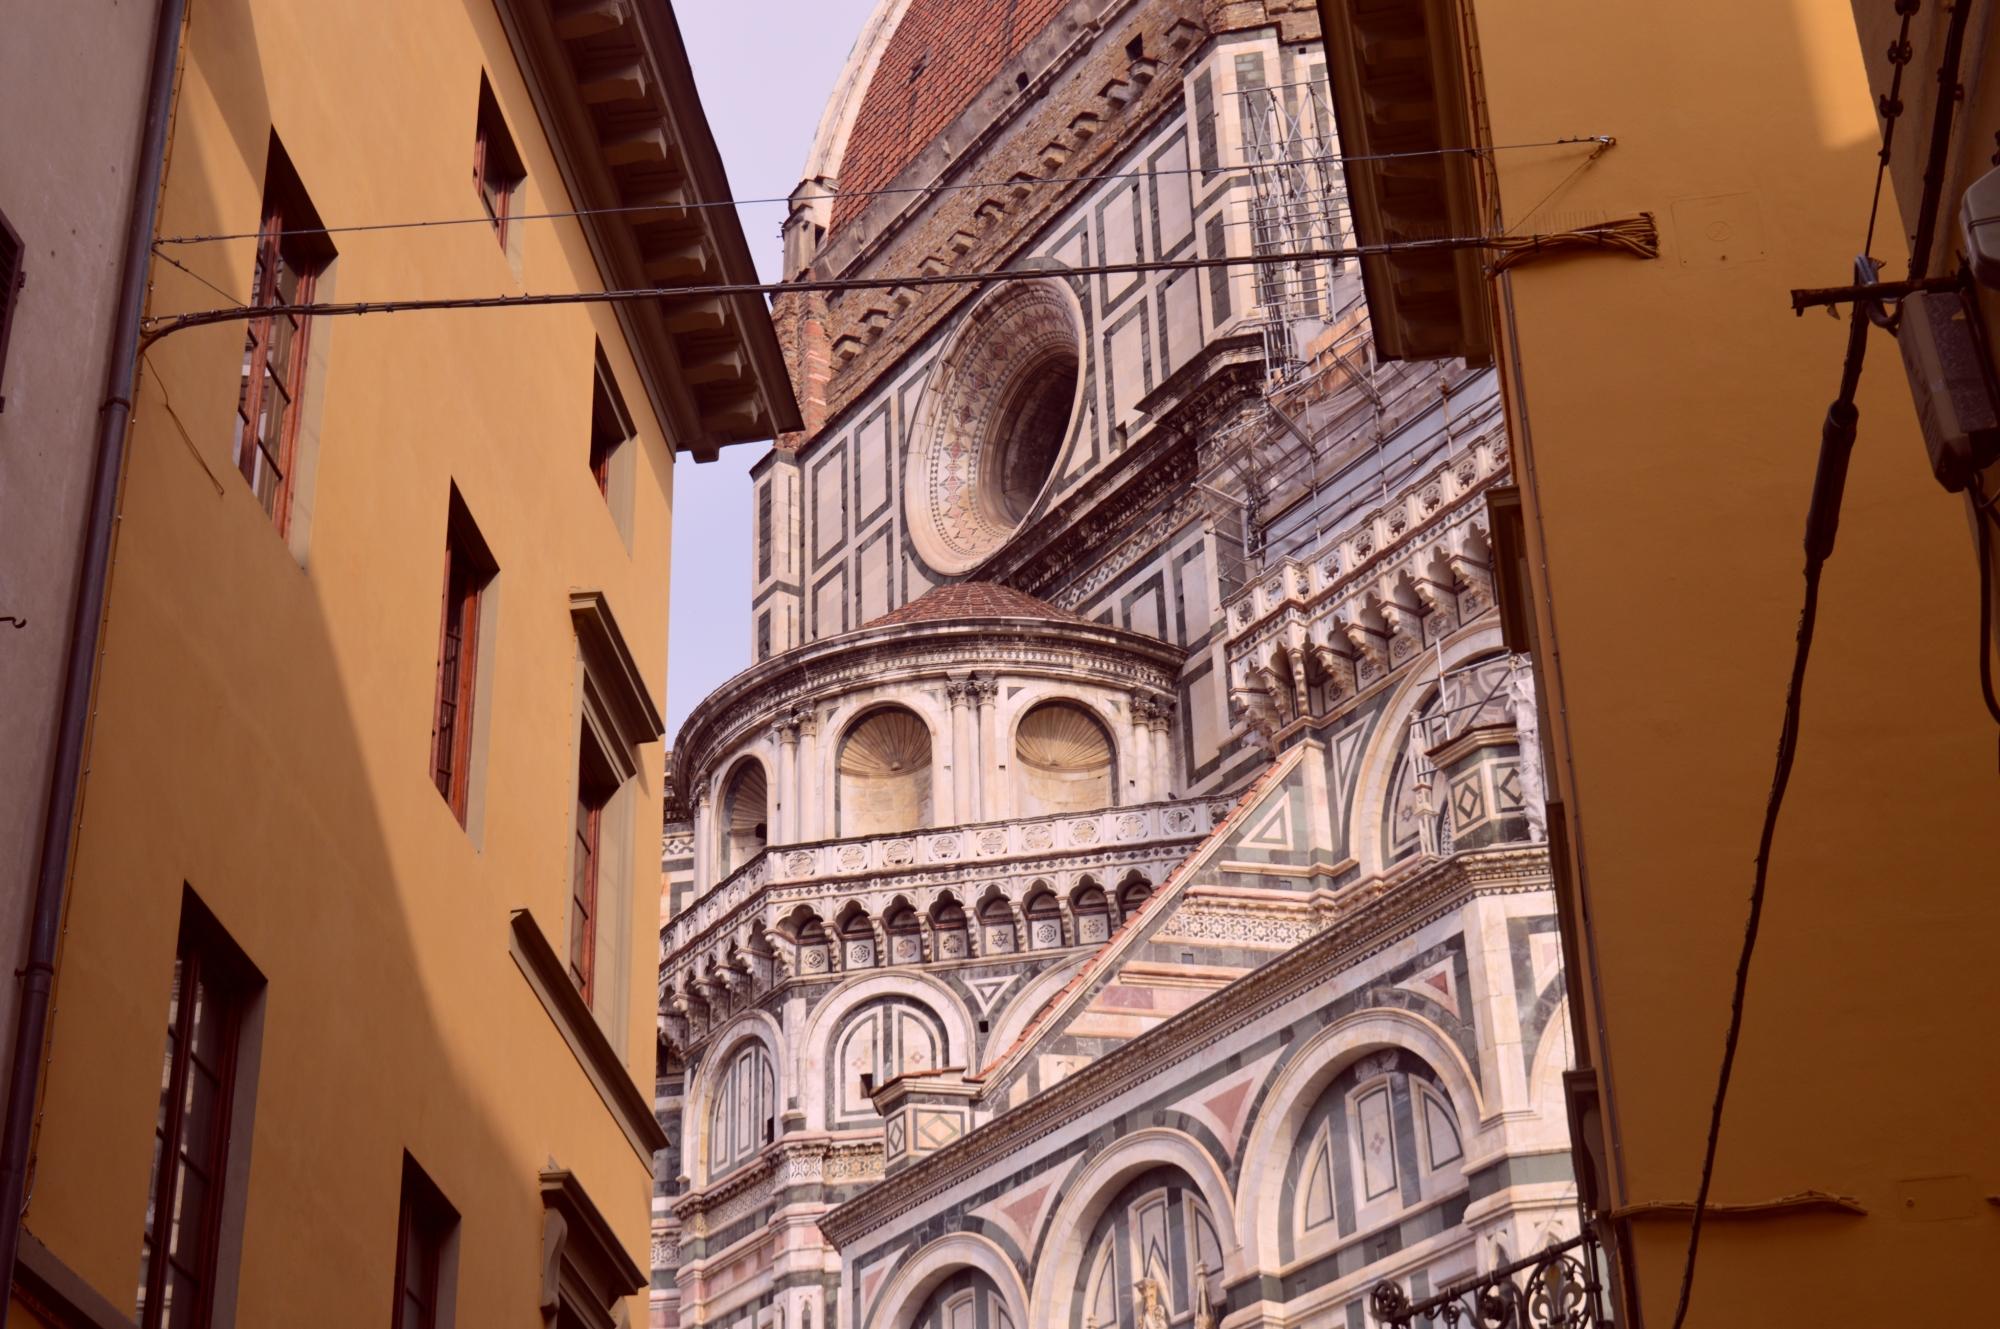 canan çetin photography santa maria fiore medici basilica firenze florence cananche travel street art